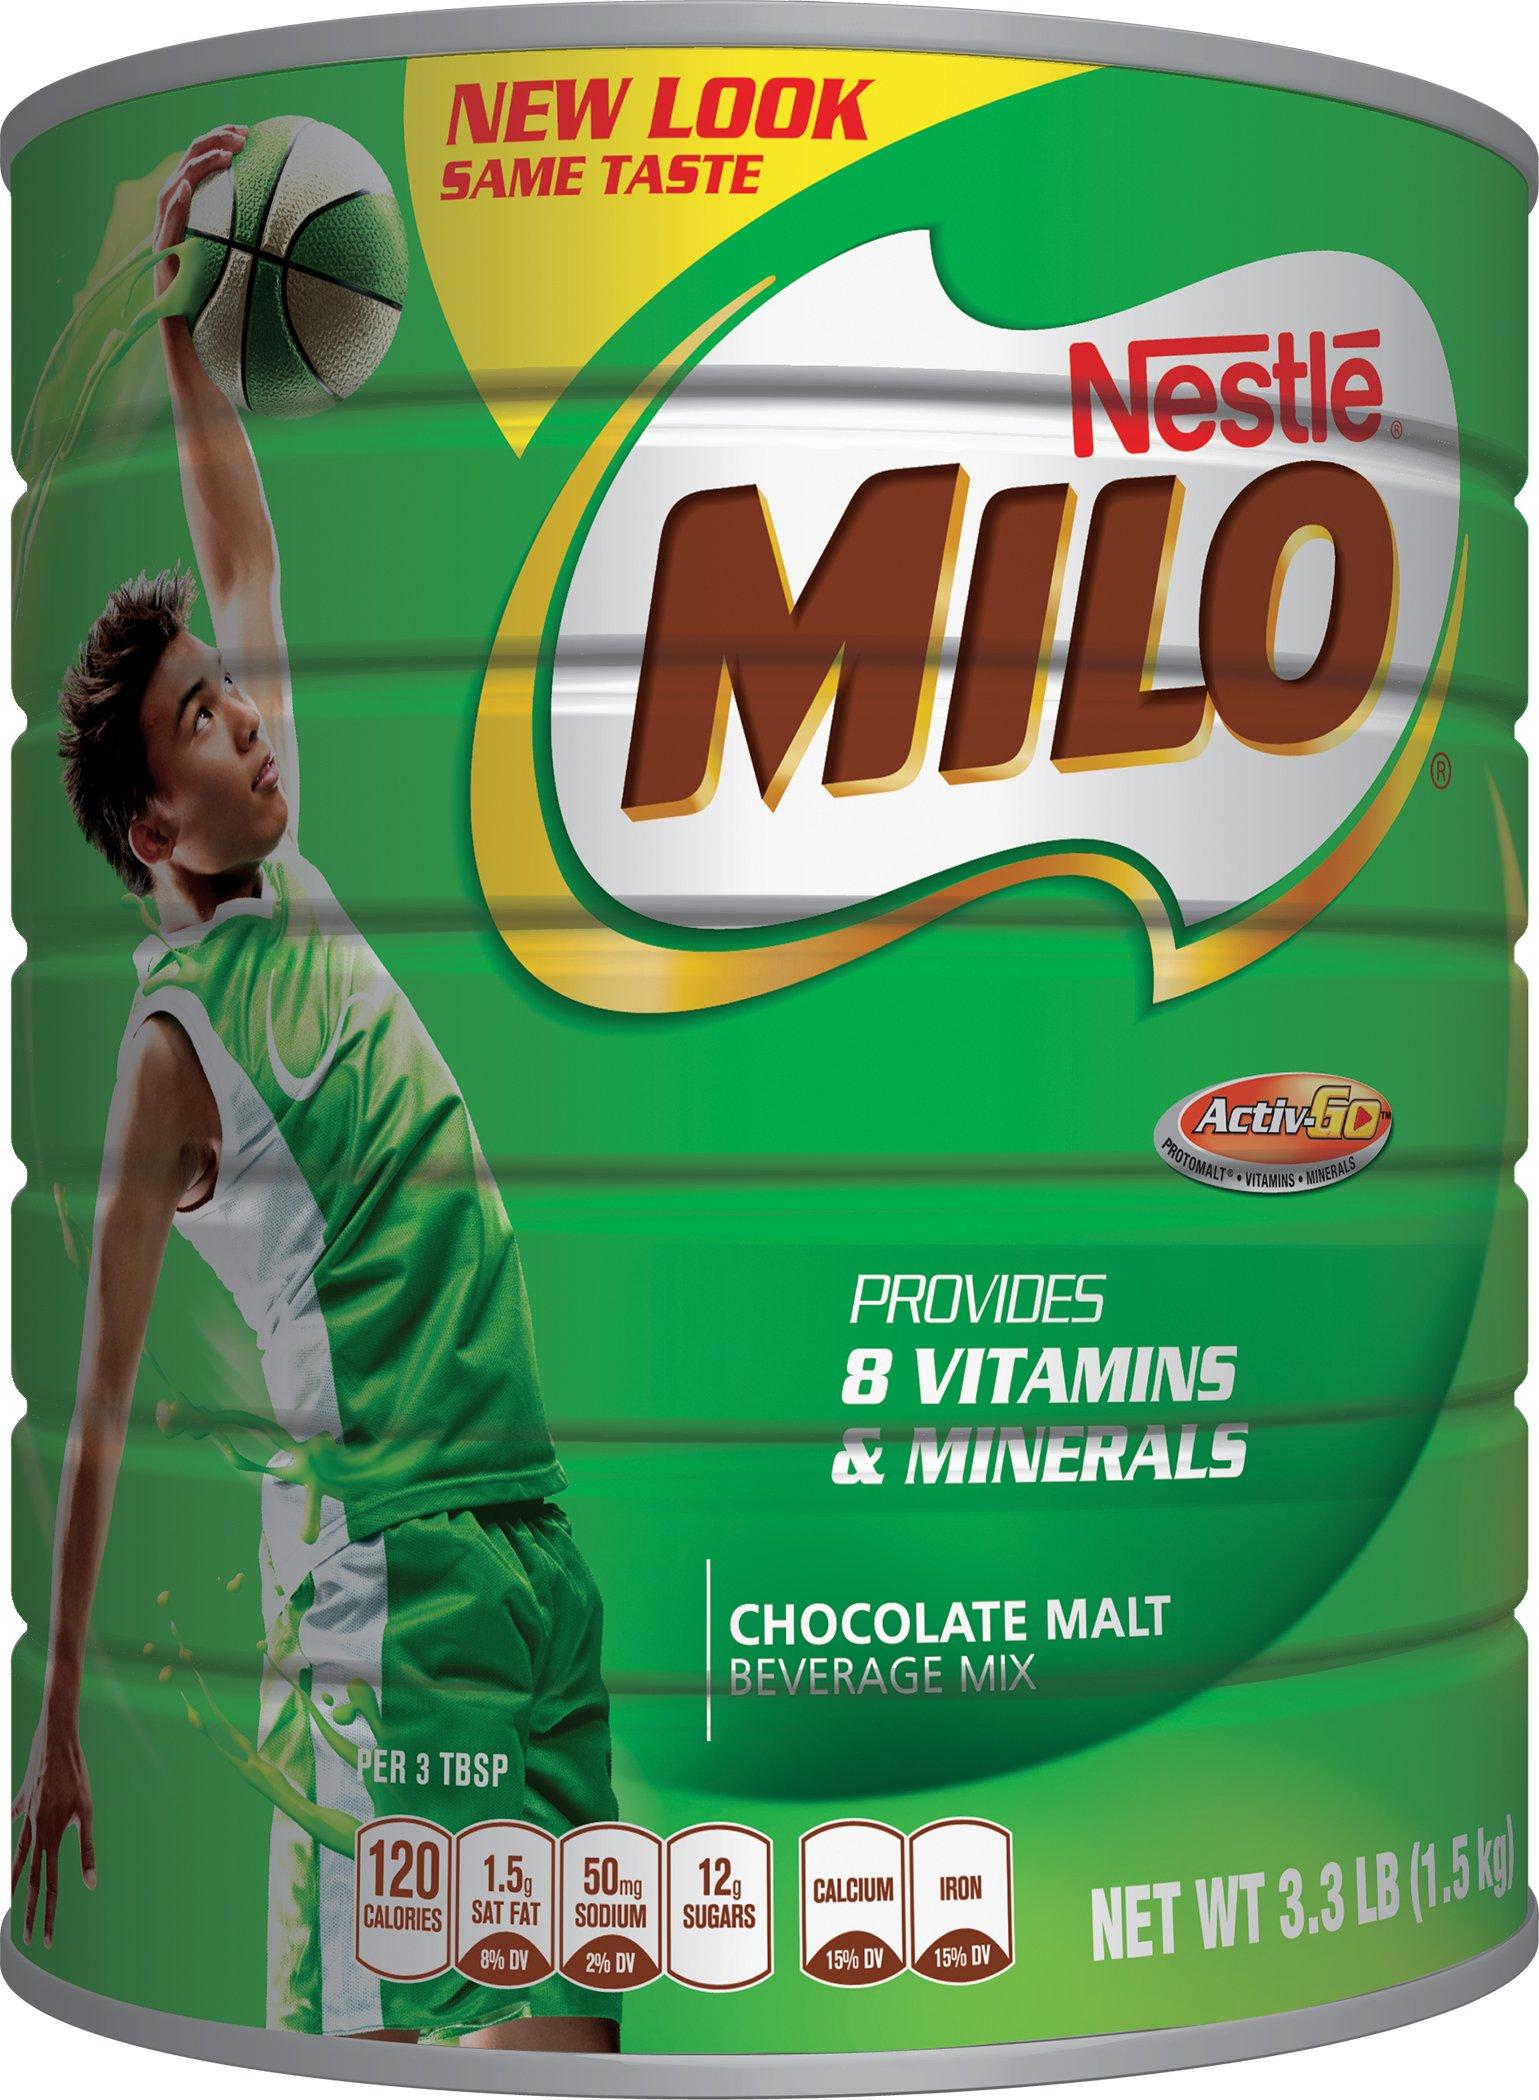 Peak Instant Full Cream Dry Whole Milk Powder 400 Dancow 1 Coklat Gram 400gr Box Nestle Milo Chocolate Malt Beverage Mix Jumbo 33 Pound Can 15kg